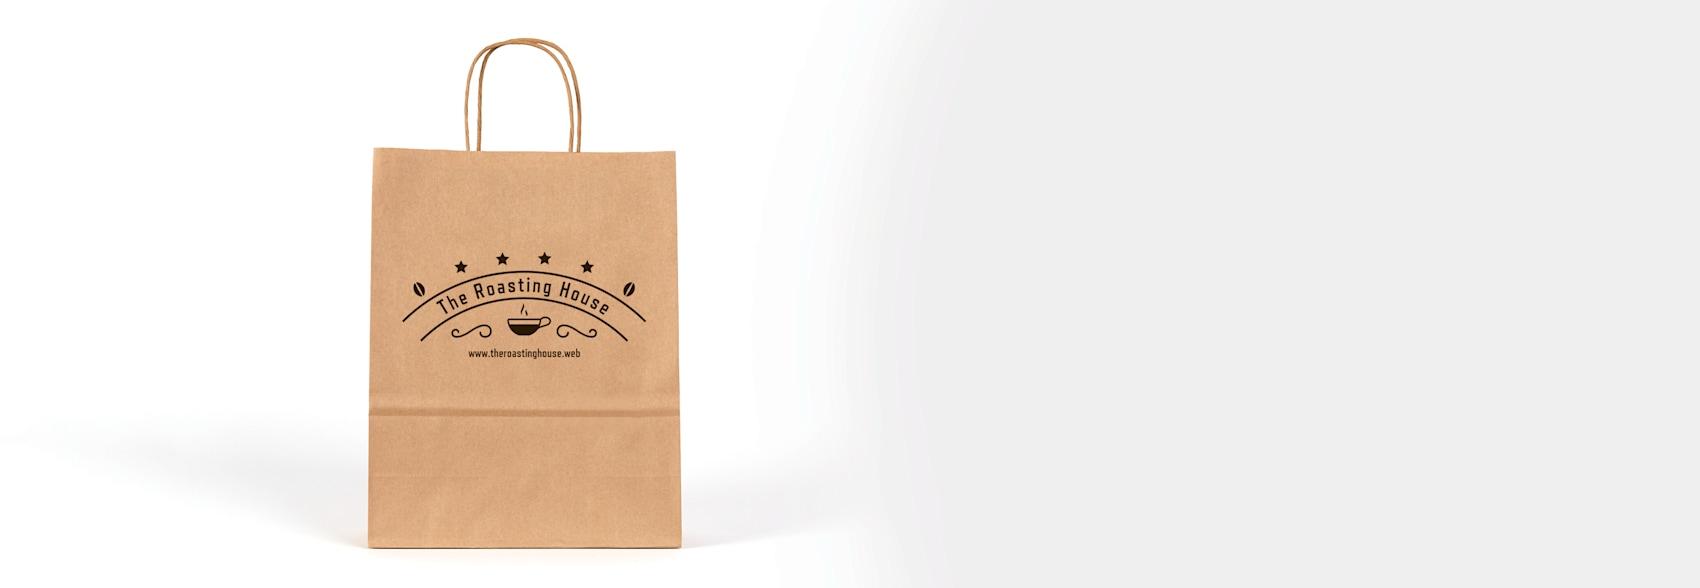 custom bags for business